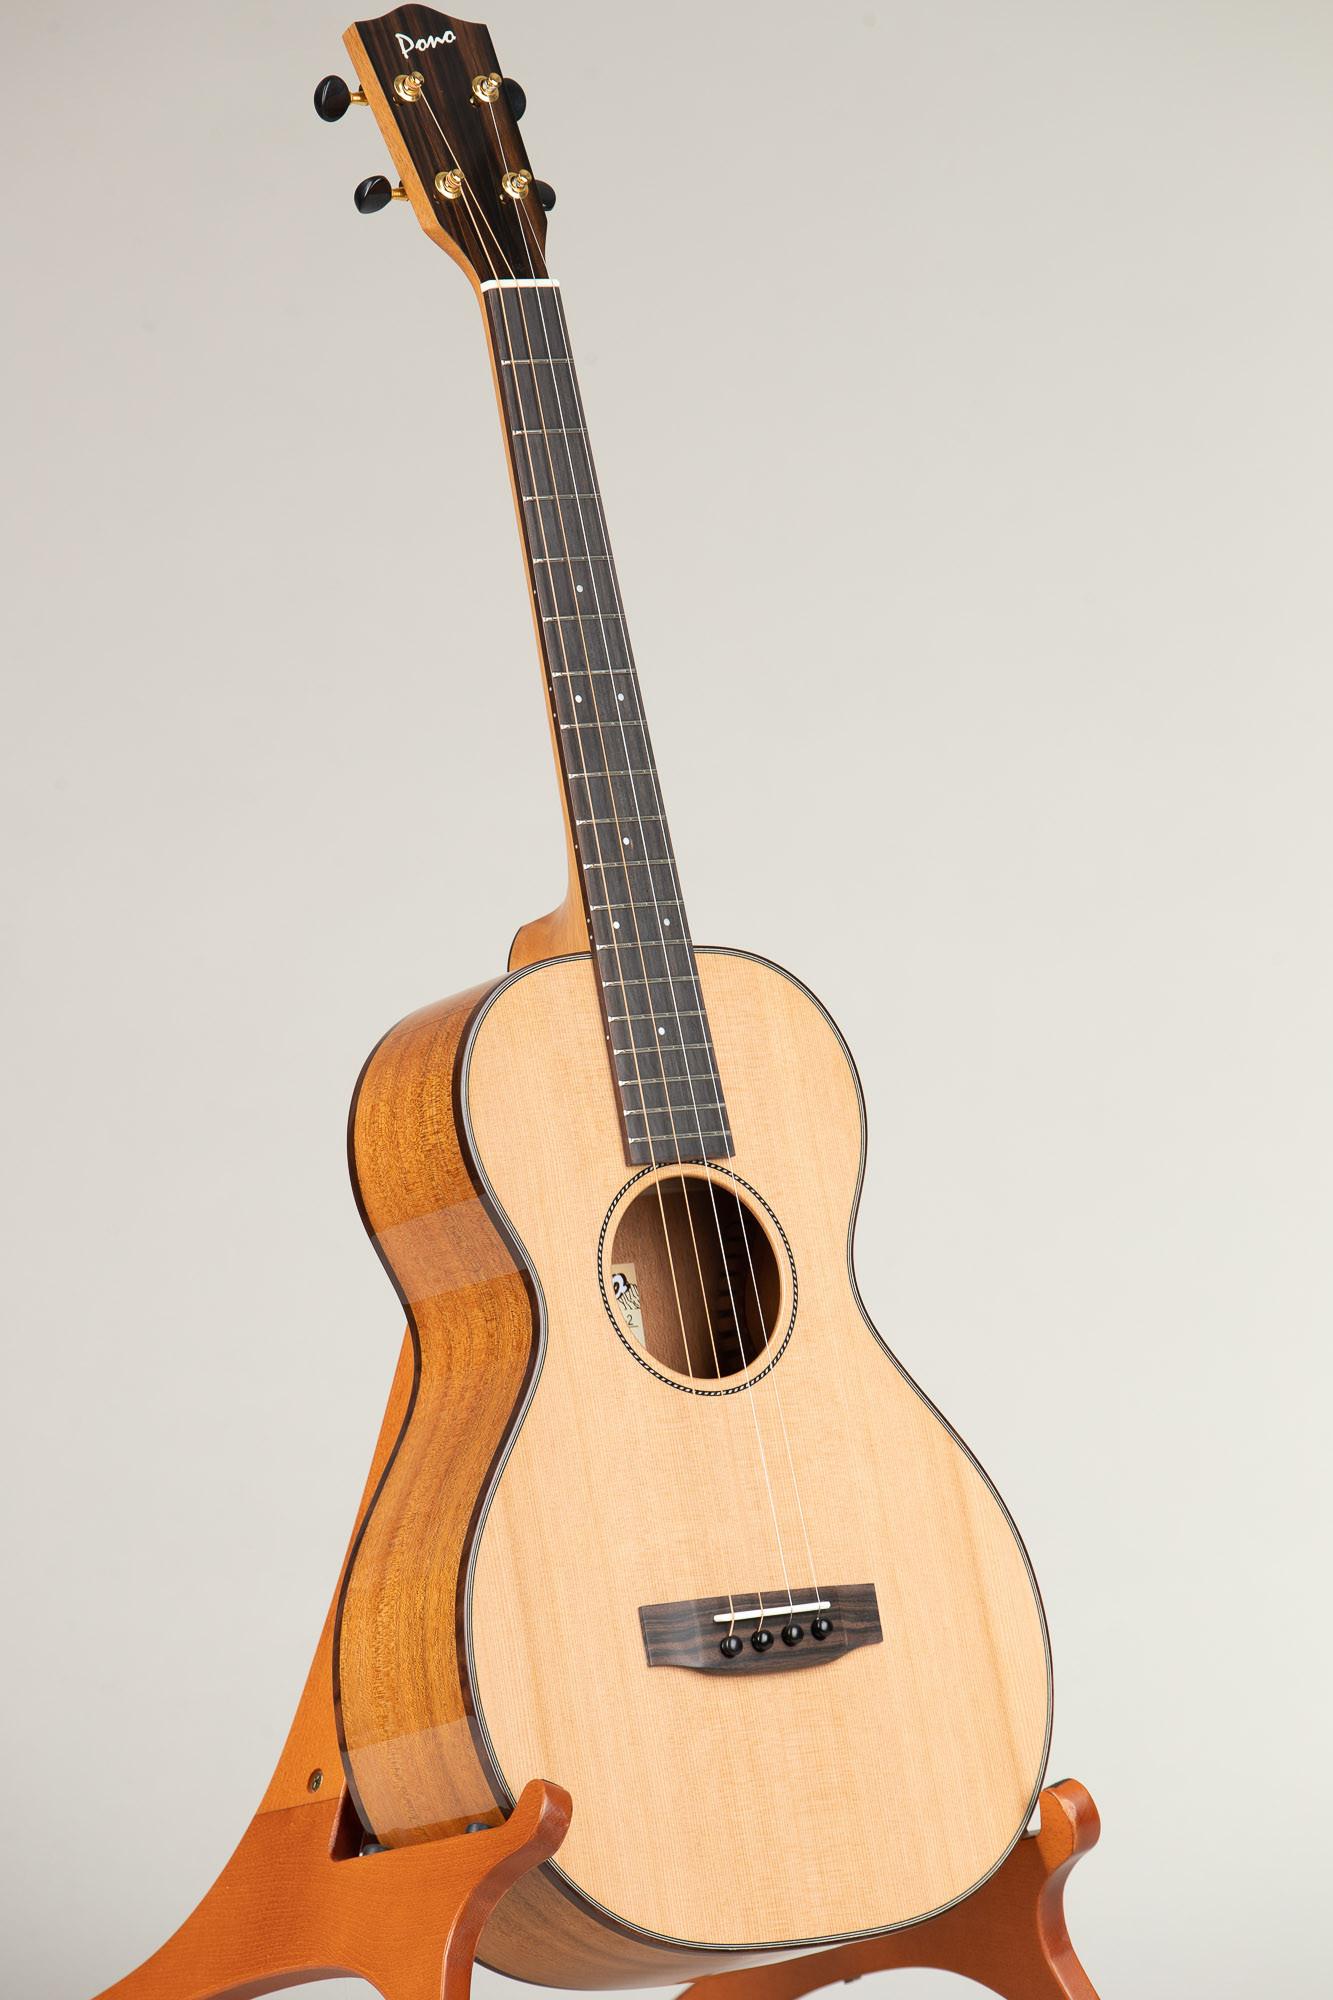 Pono Cedar Mahogany Steel String Baritone (UL4-2 3128)